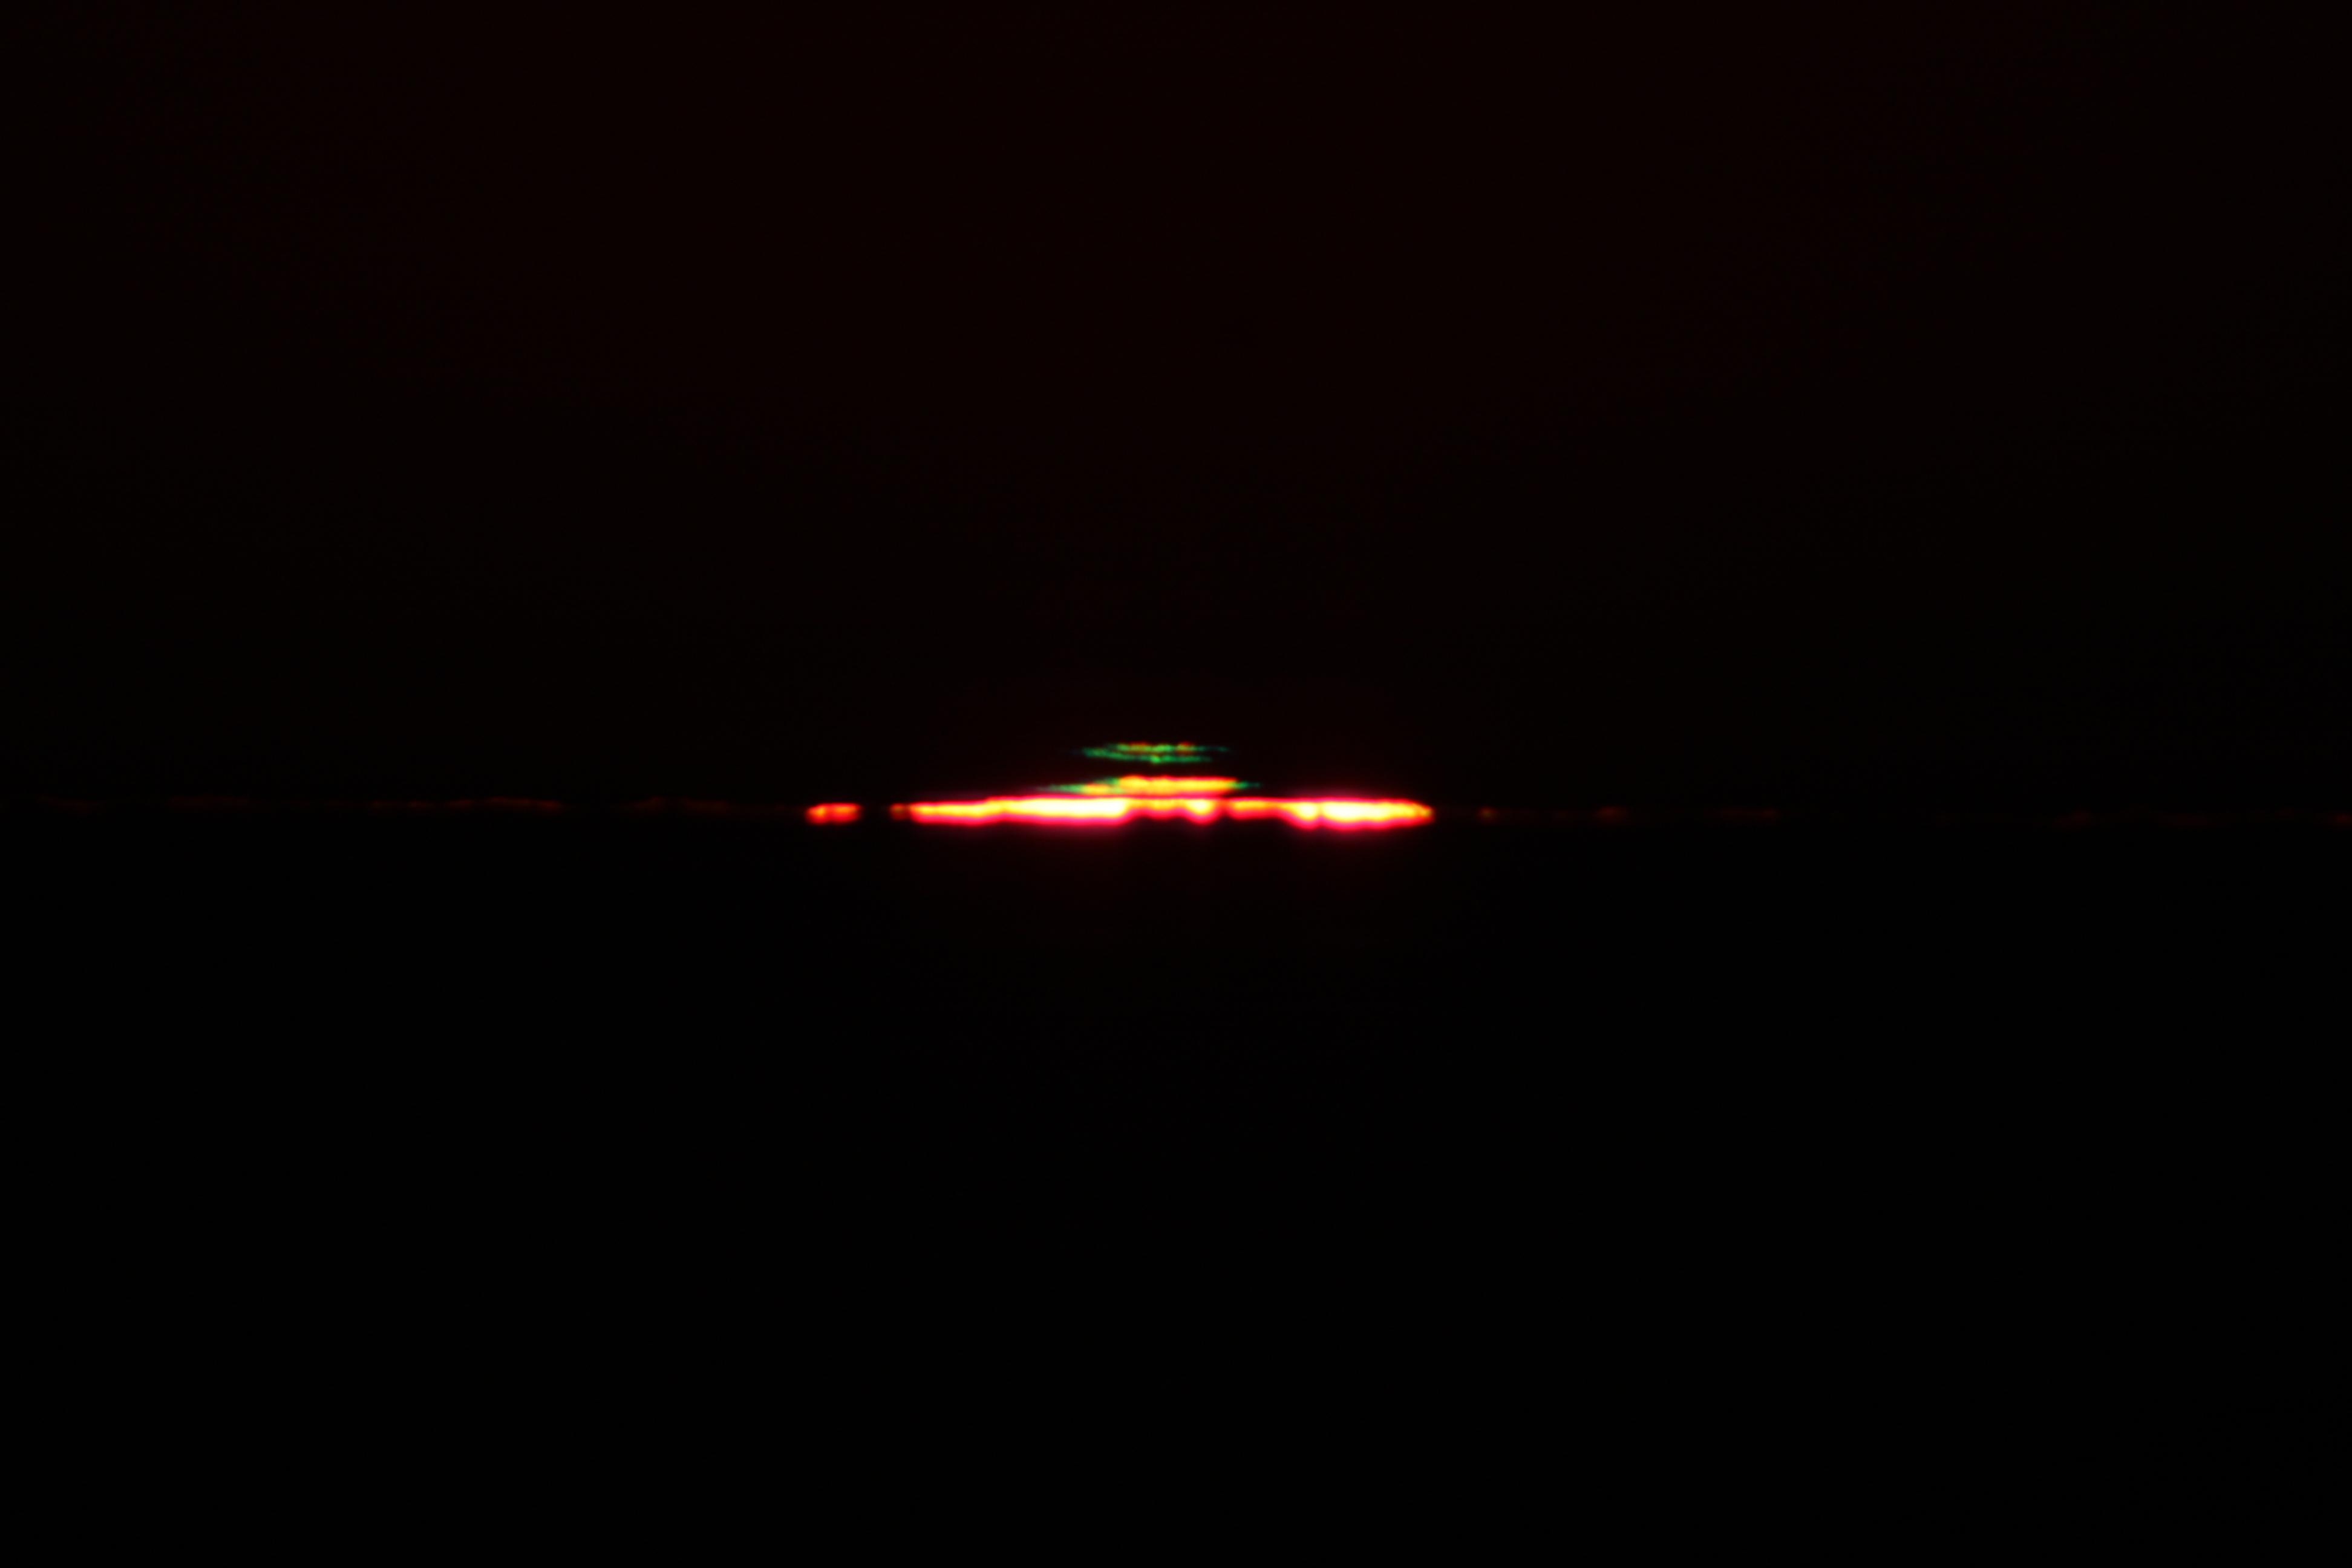 [Rayon vert depuis l'Observatoire de La Silla, Chili, le 5 novembre 2010]